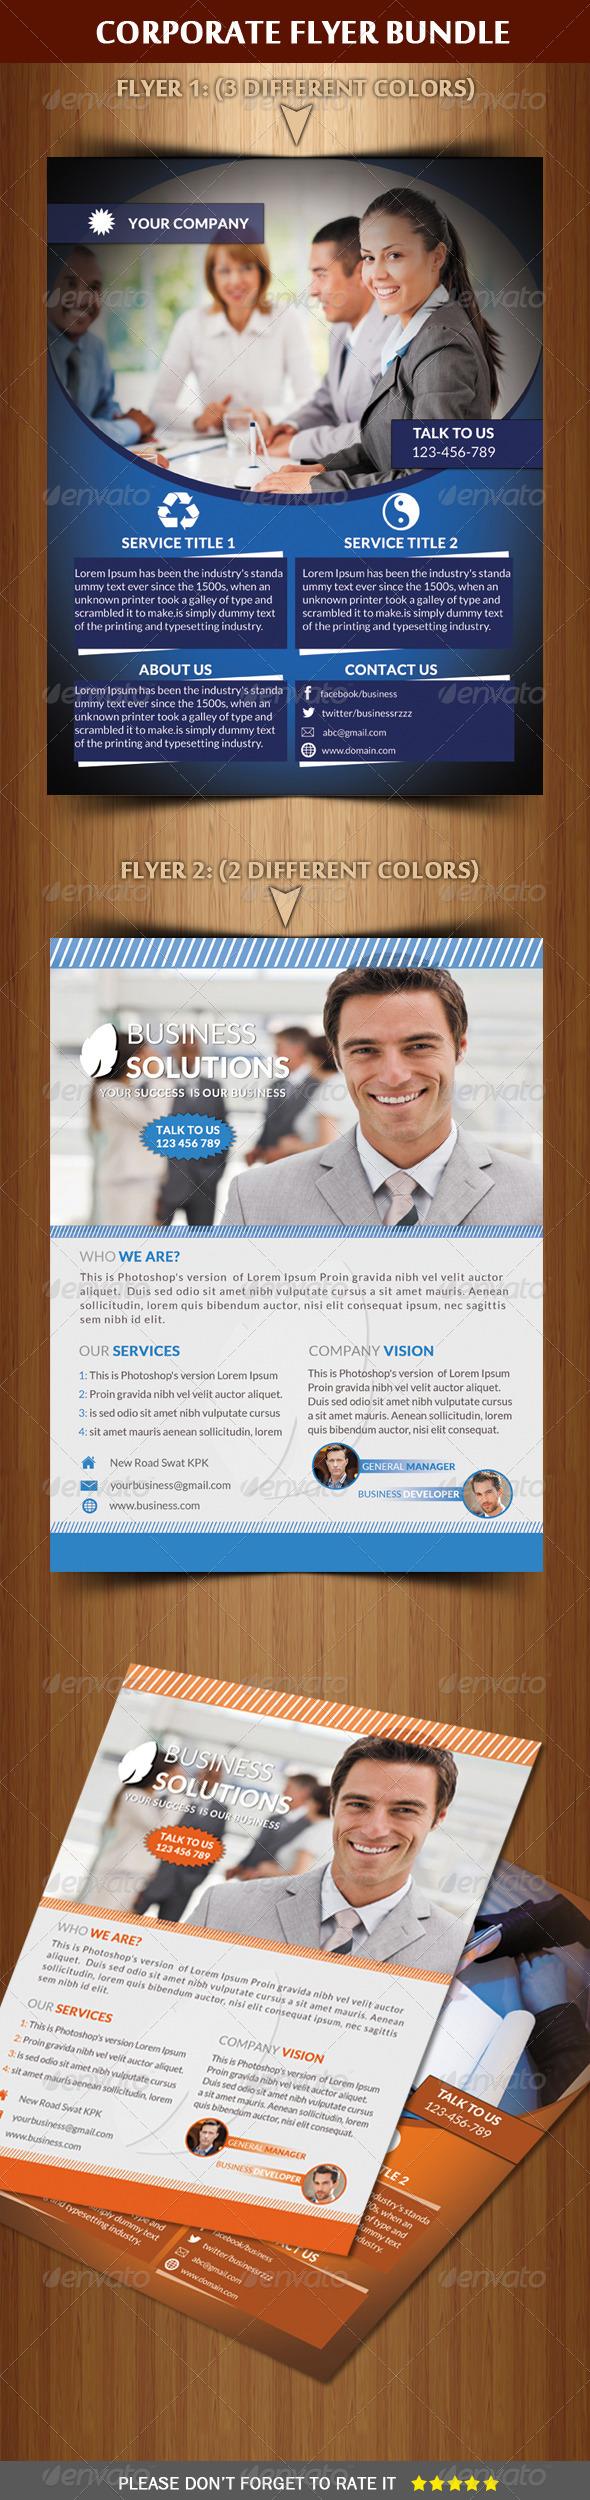 GraphicRiver Corporate Flyer Bundle 6568503